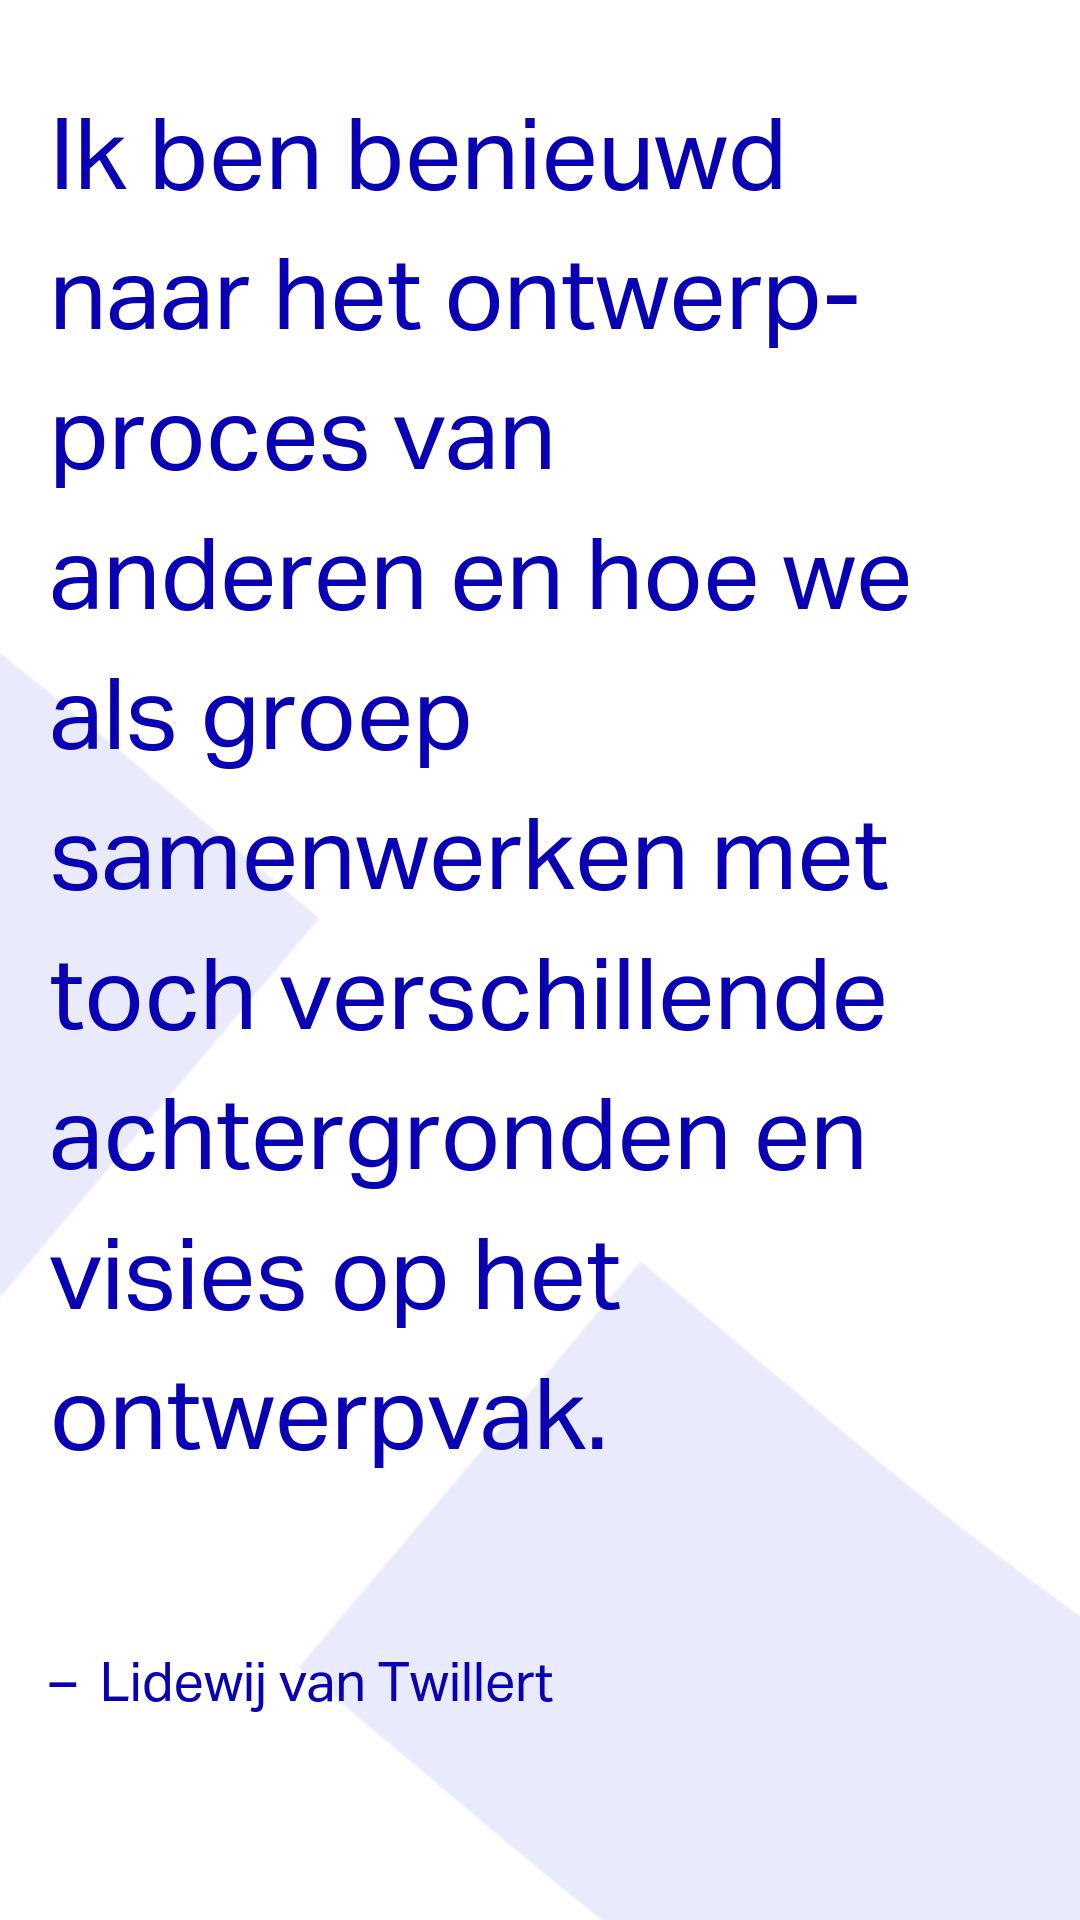 Taskforce-Fashion-Fashion-After-Flood-kennismaking-Lidewij-van-Twillert.png